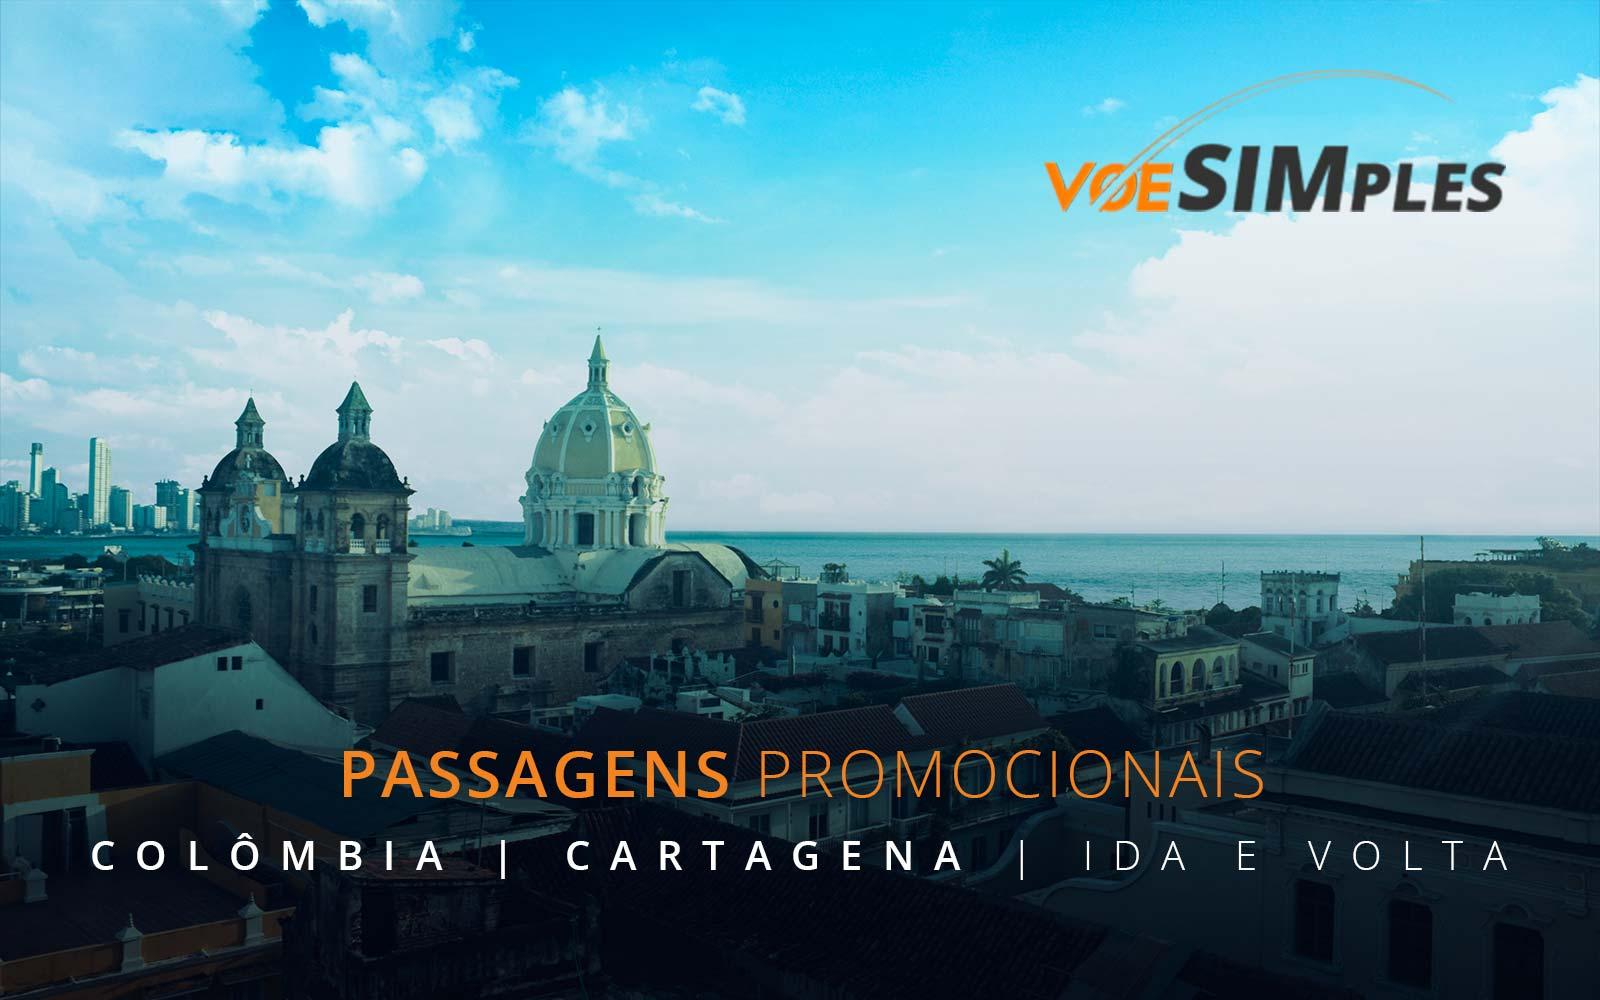 passagens-aereas-promocionais-america-sul-voe-simples-passagens-aereas-baratas-promocao-passagem-aviao-passagens-aereas-brasil-colombia-cartagena